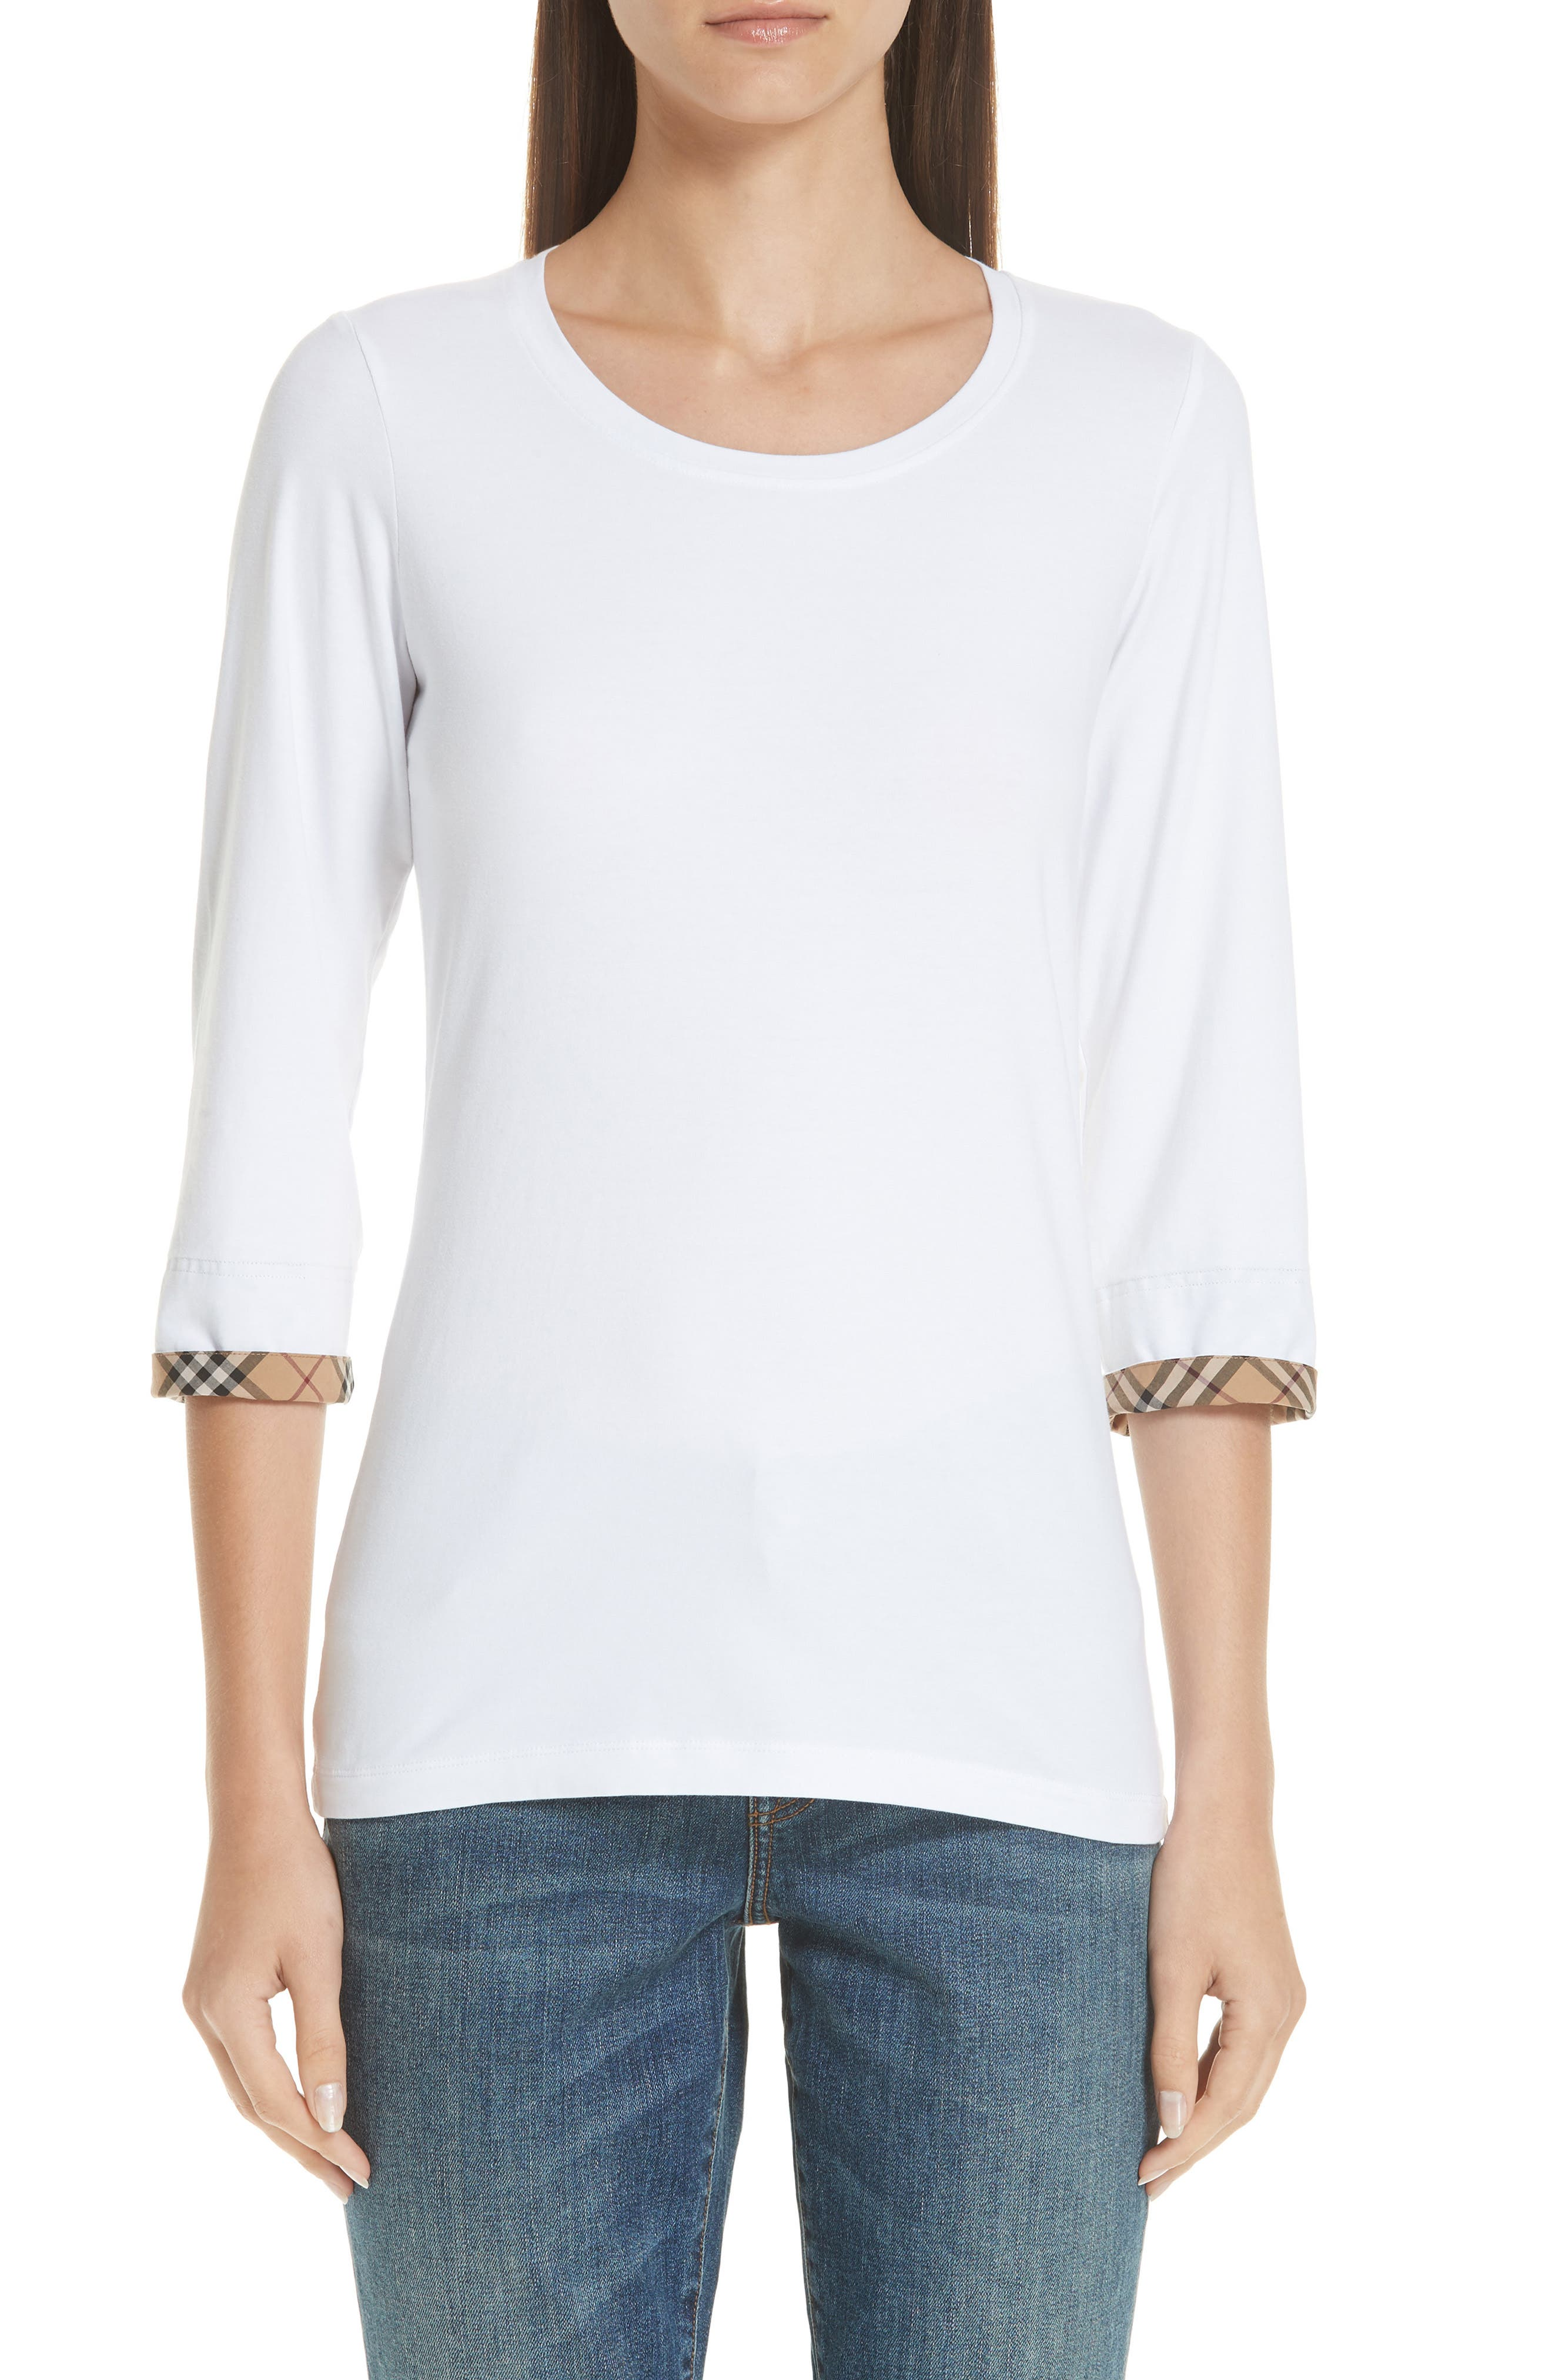 T-Shirt for Women On Sale, Brown, Cotton, 2017, 10 12 14 8 D.exterior